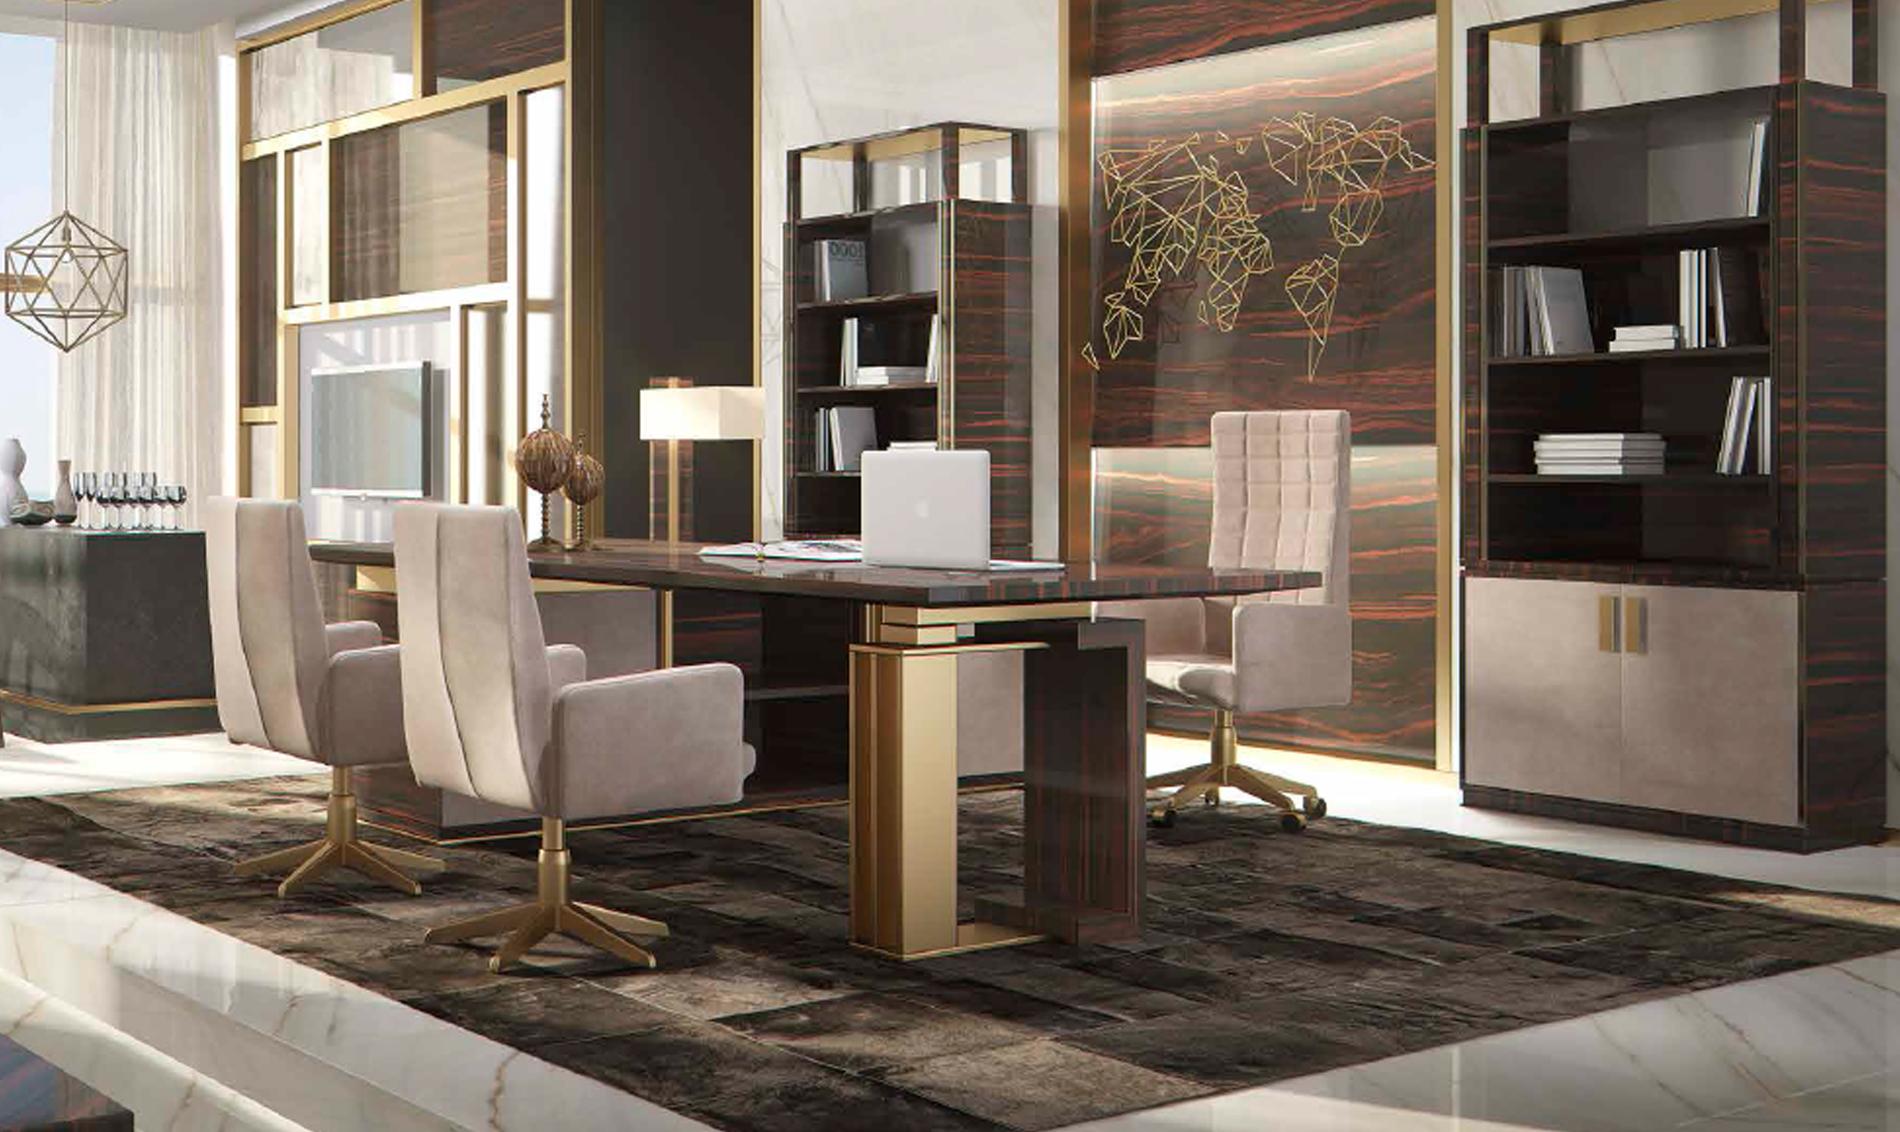 Muebles De Dormitorio Dise O Moderno Alta Gama  # Muebles Grupo Teo